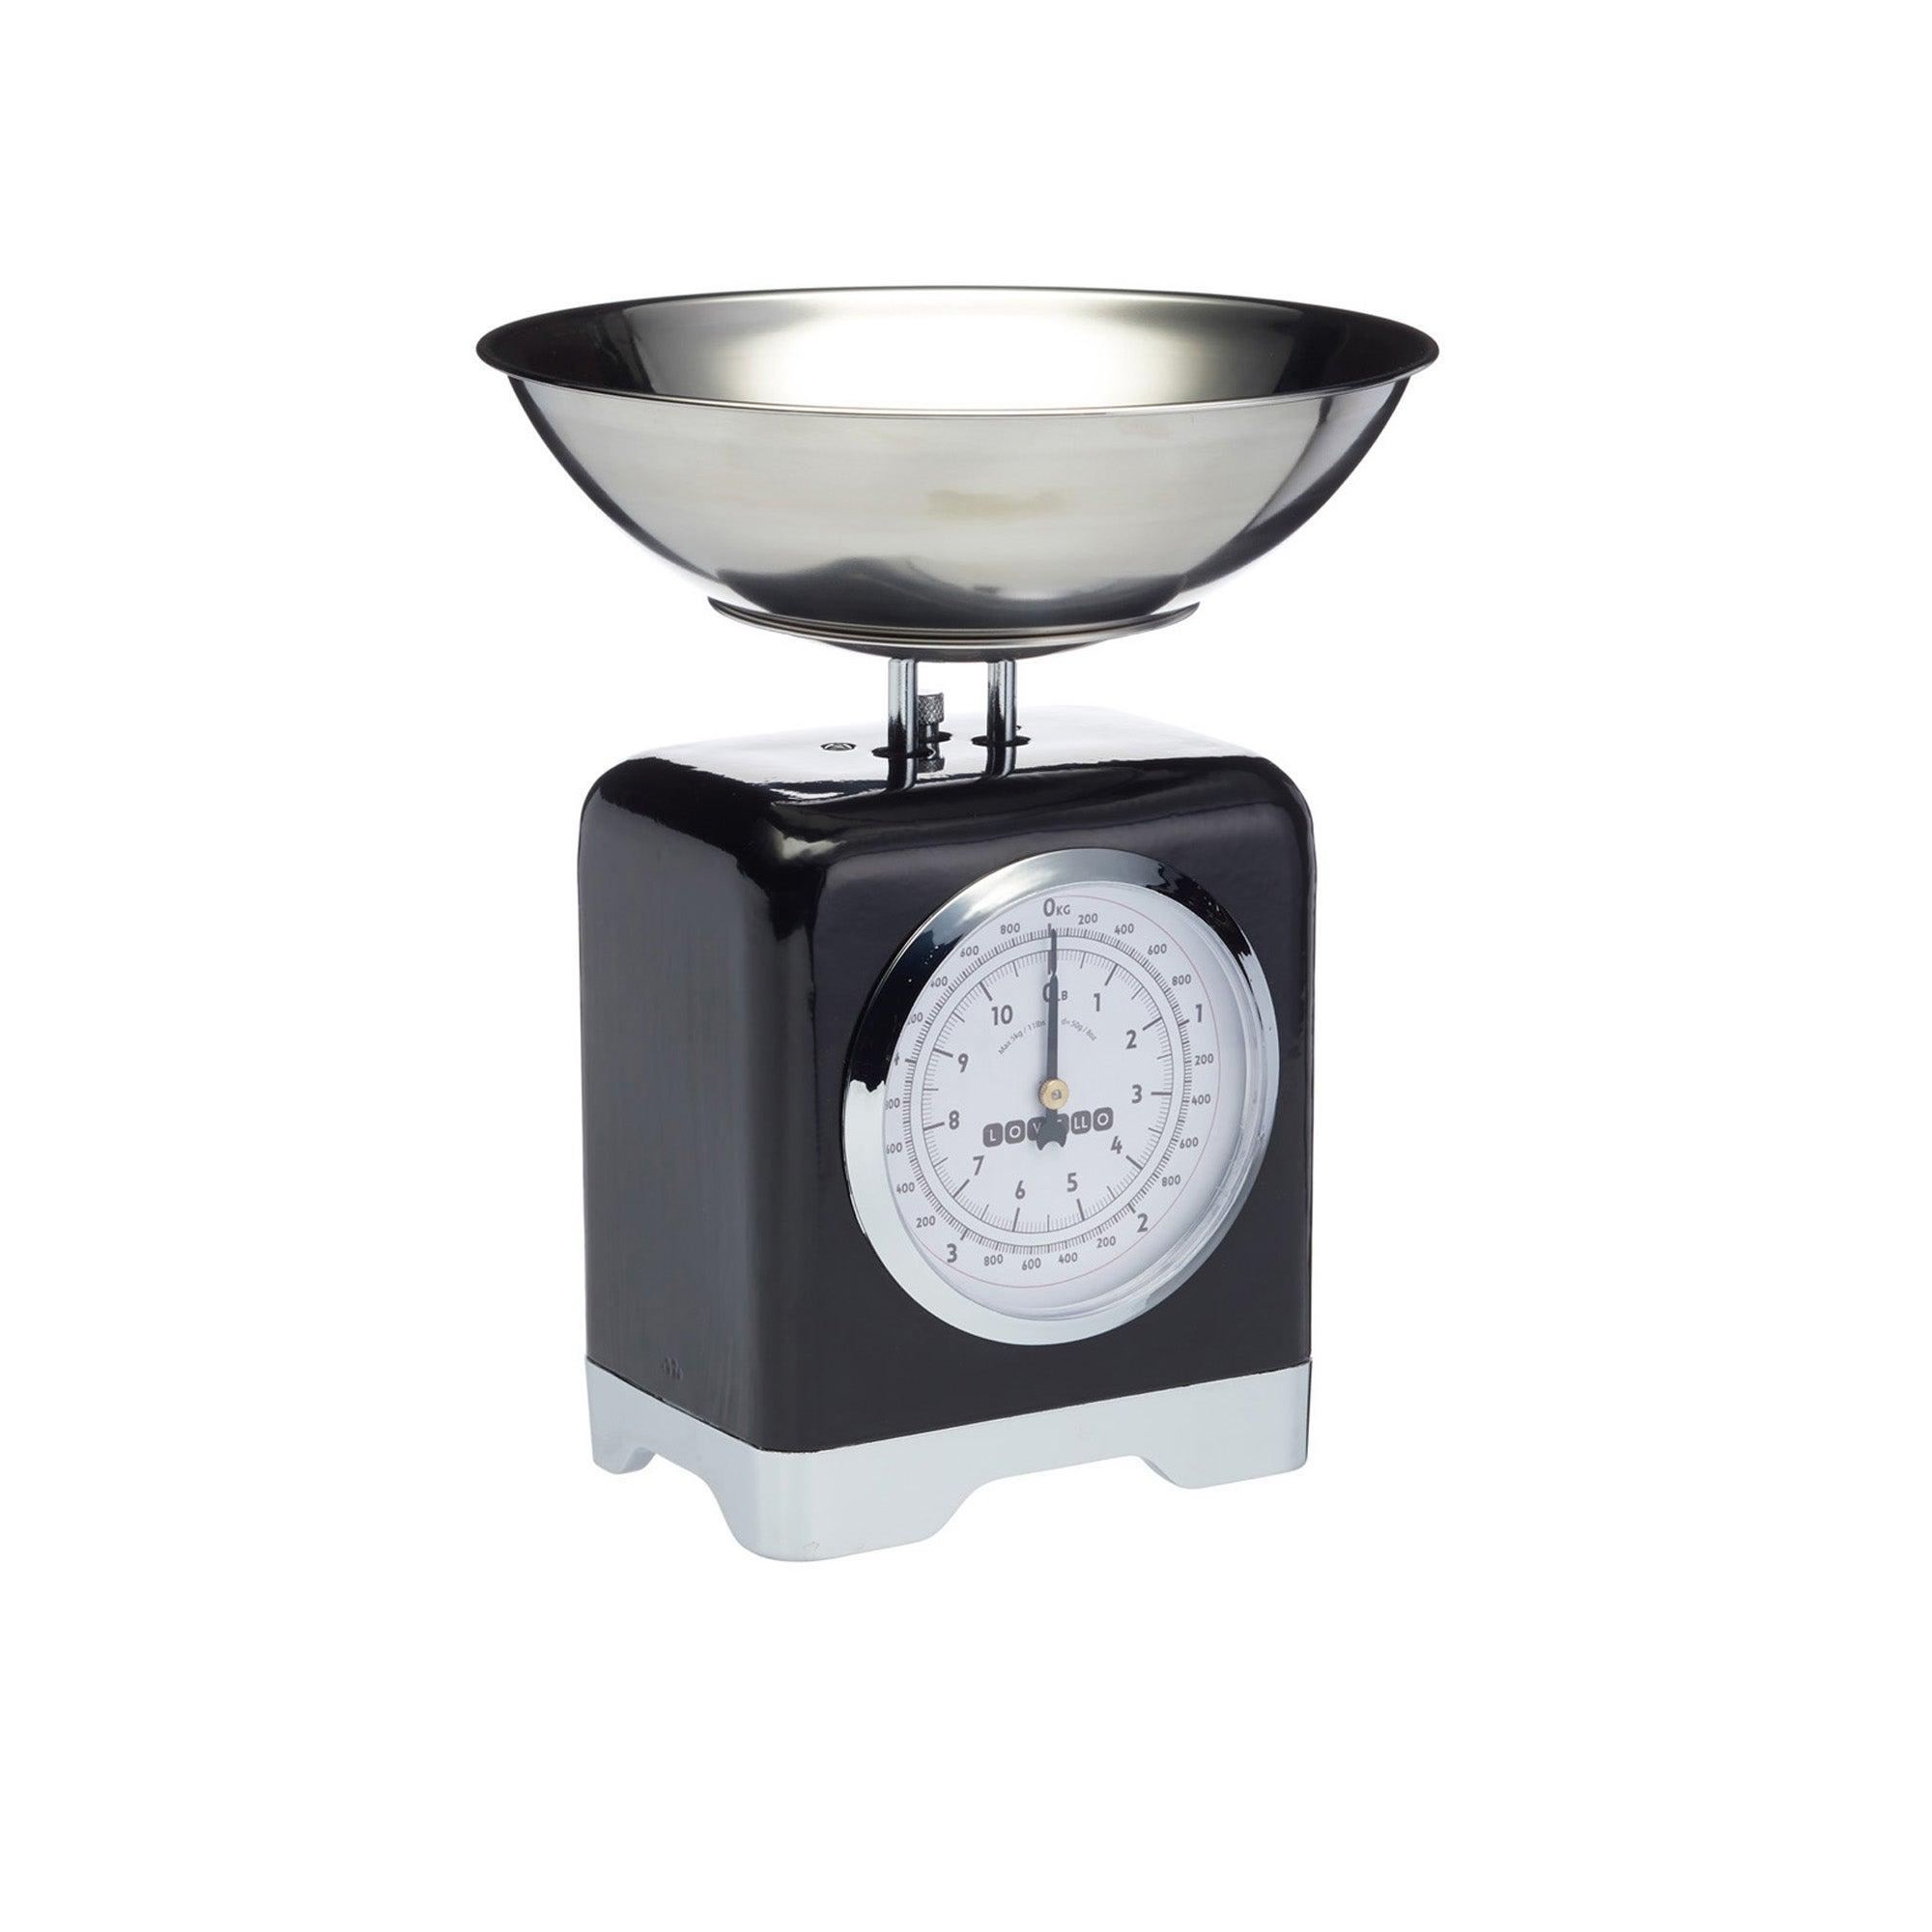 Lovello Mechanical Black Kitchen Scales Black